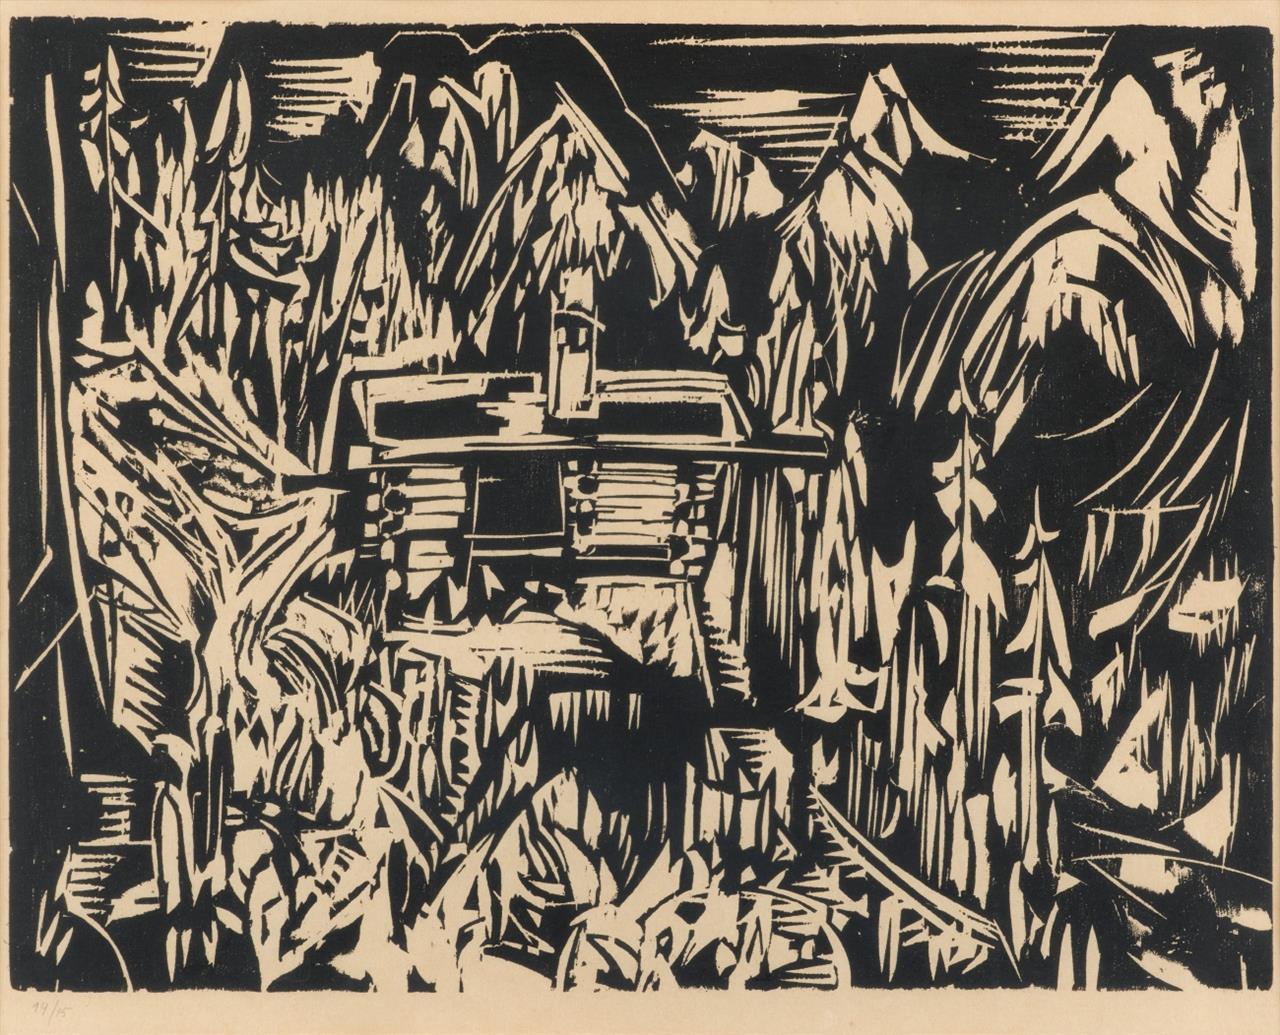 Albert Müller. Lärchenhüsli. 1925 (1968). Holzschnitt. Posthumer Abzug. Nachlassstempel.